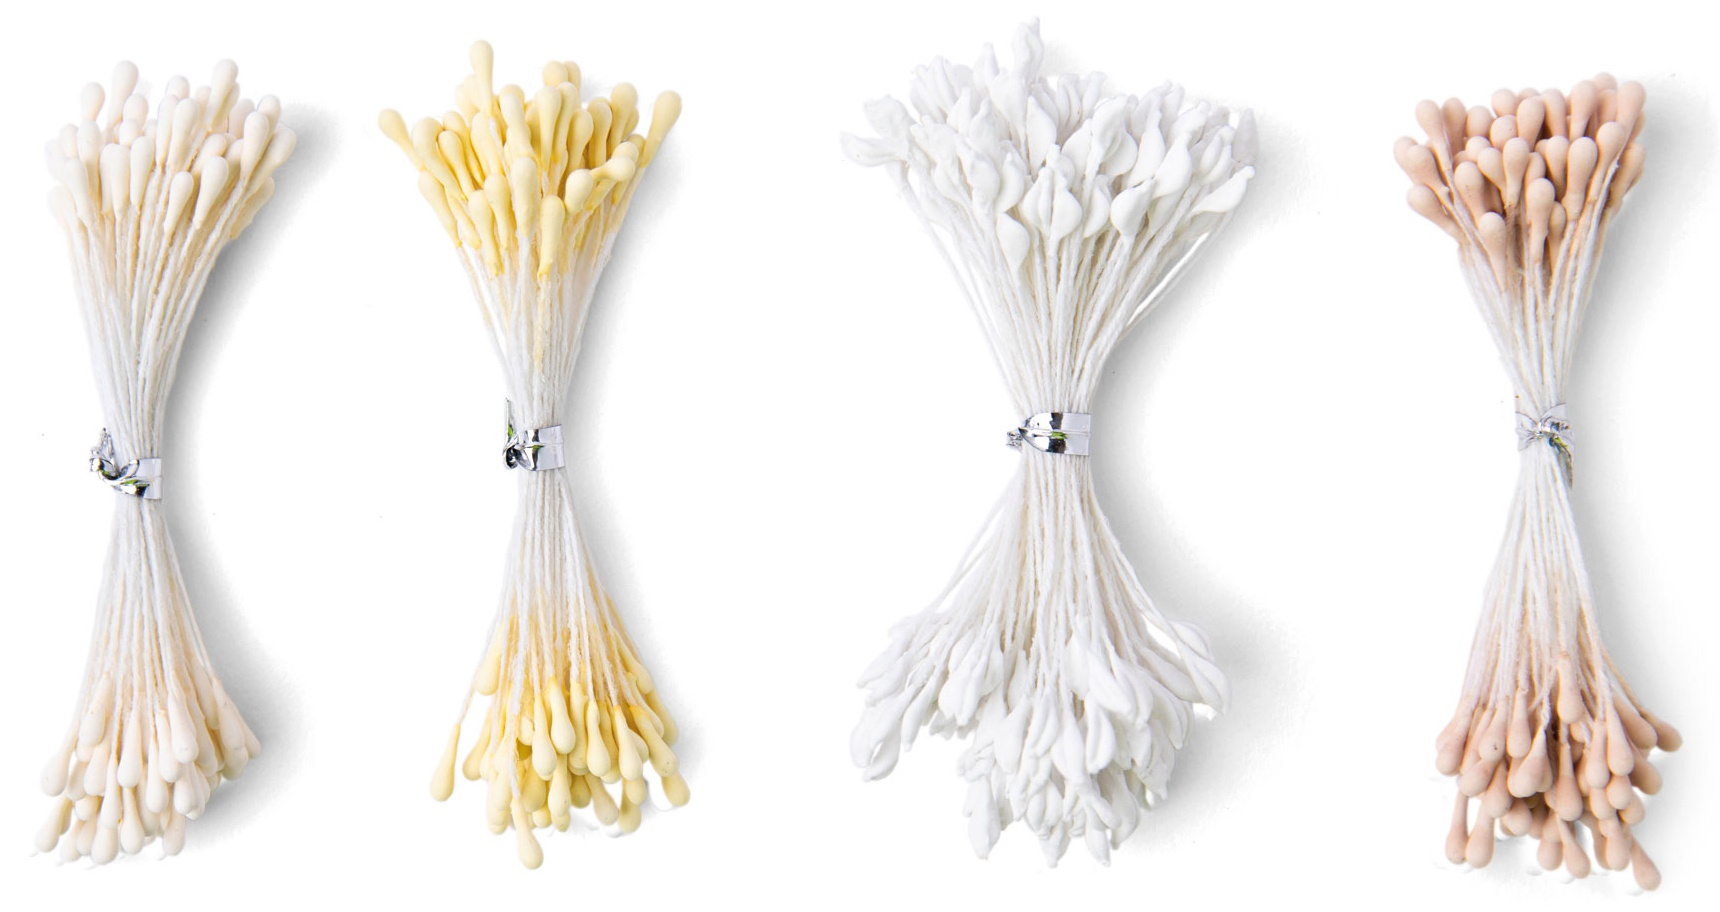 Sizzix flower stamens per bundle